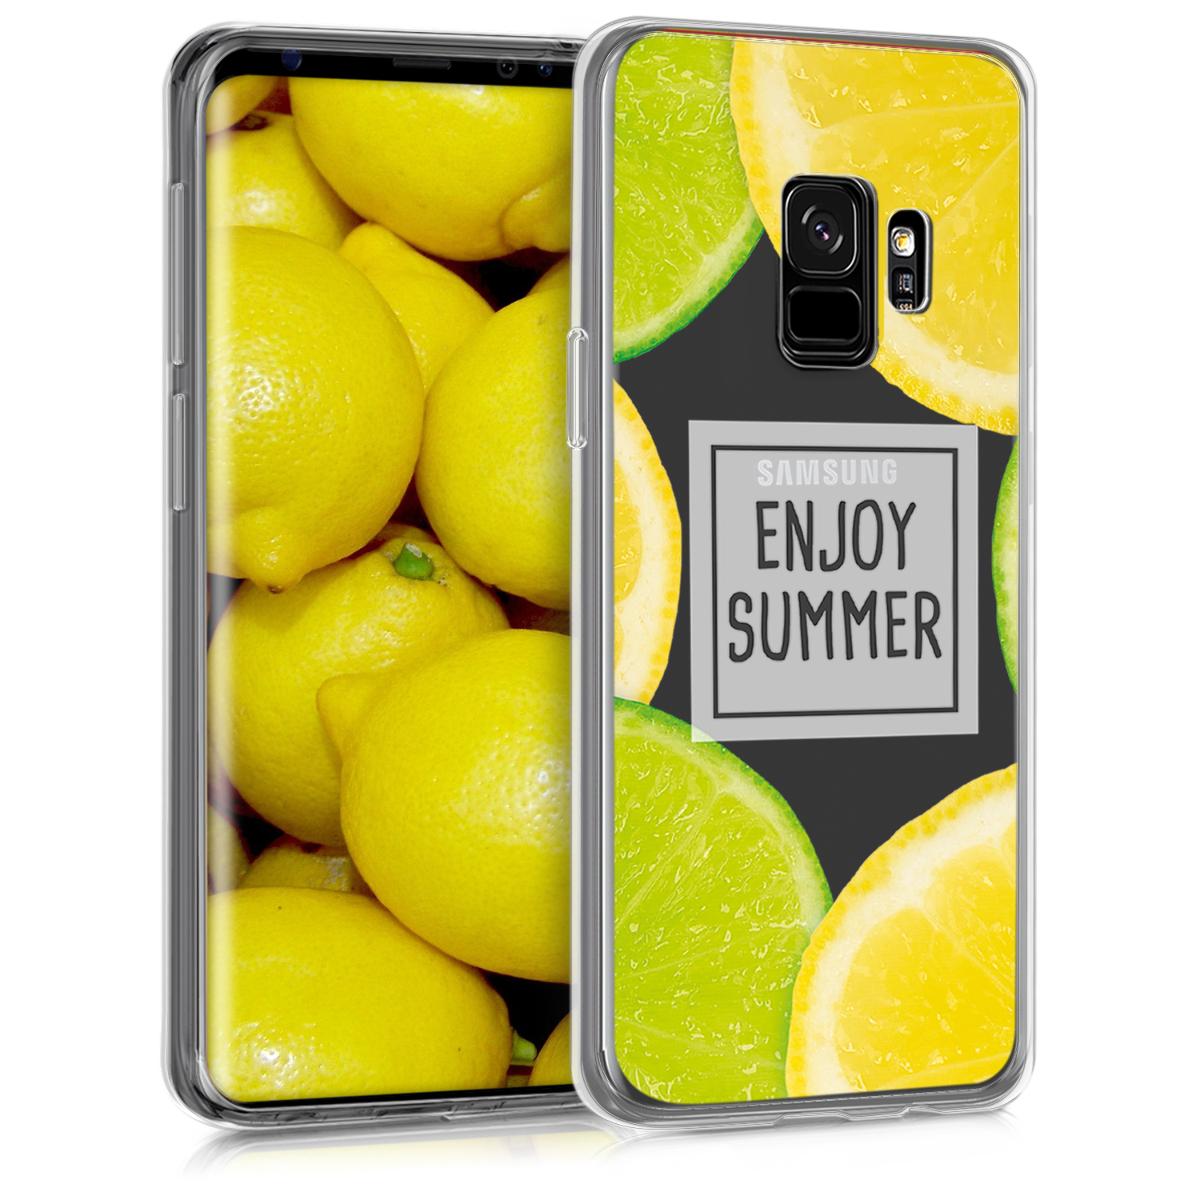 Transparentní pouzdro pro  Samsung Galaxy S9 - TPU Smartphone Backcover - Enjoy Summer Yellow / Green / Transparent